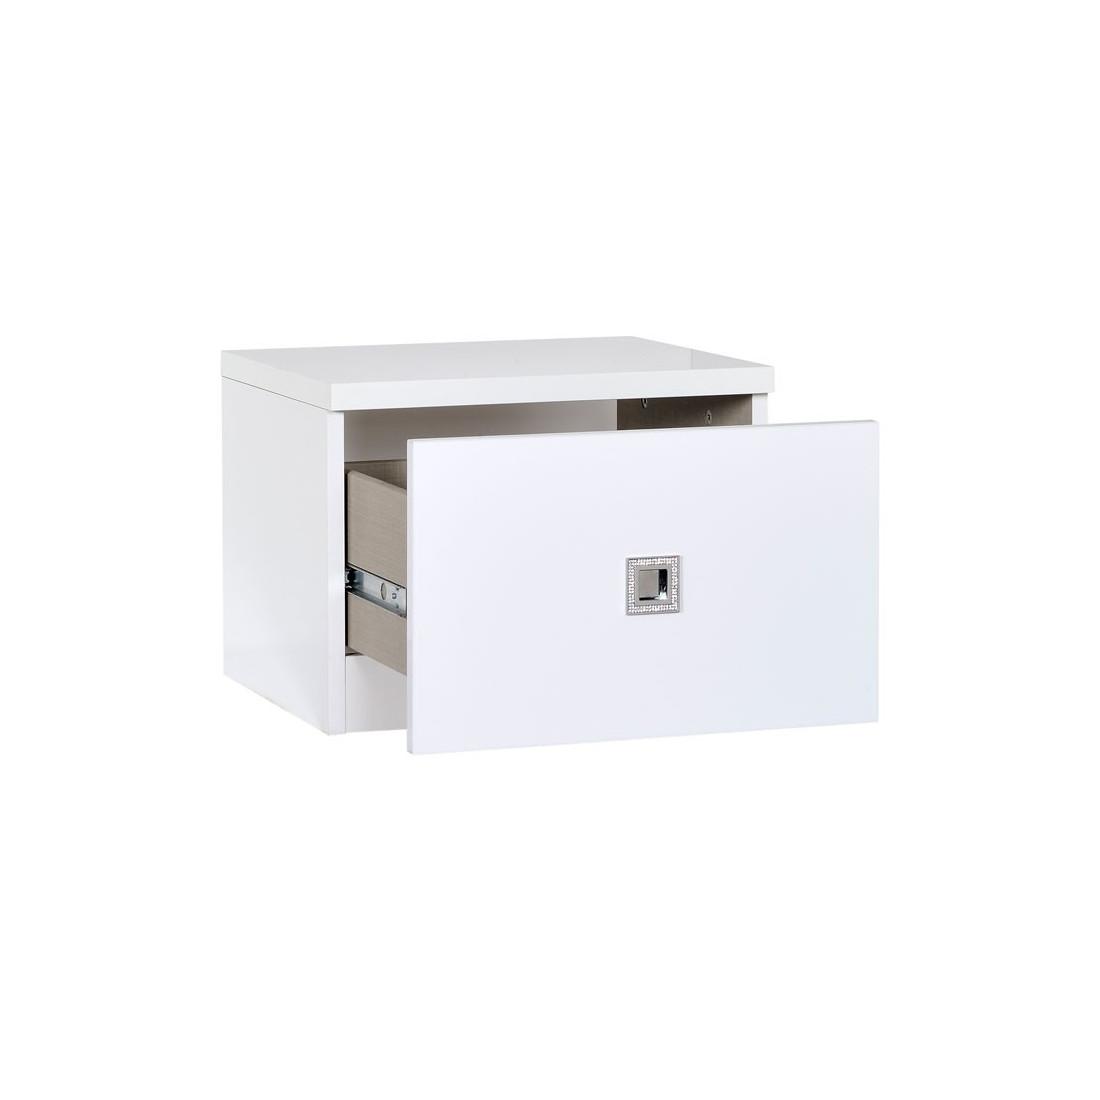 Table de chevet 1 tiroir poign e strass glass univers de for Table de chevet laque blanc brillant